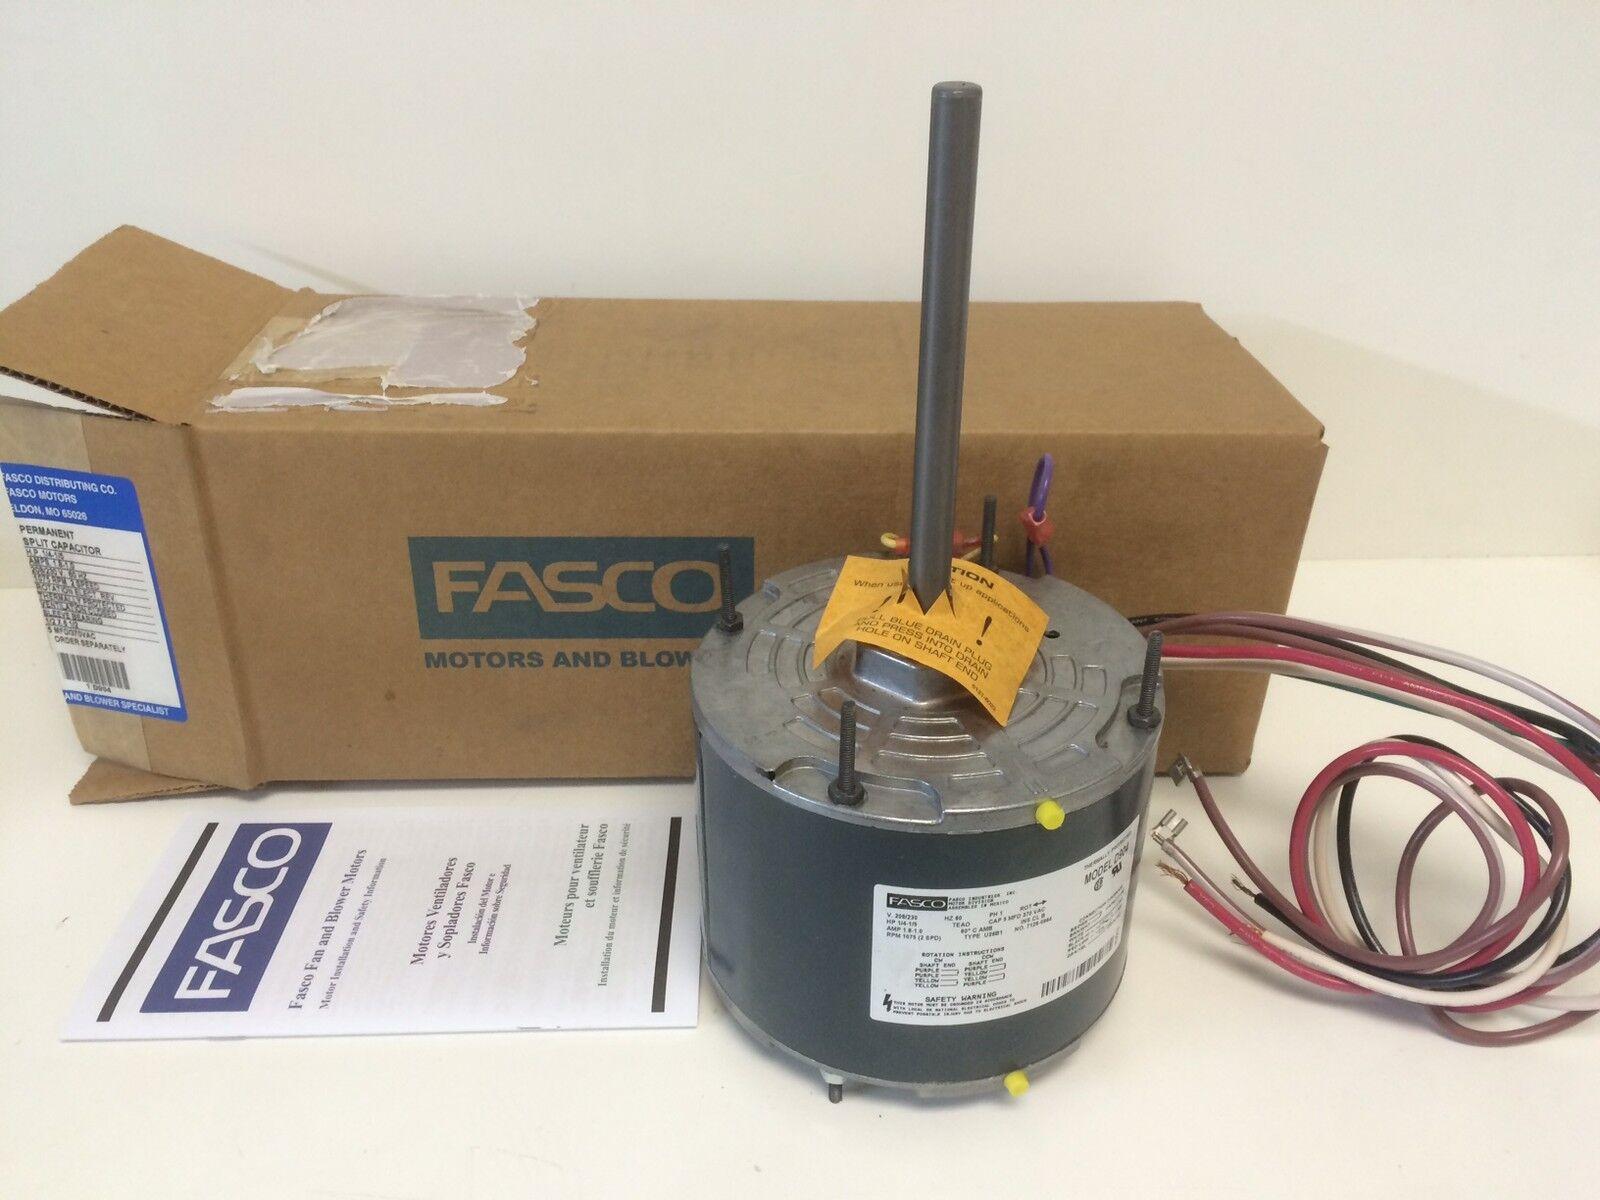 NEW IN BOX FASCO 1/4 1/5 PERM SPLIT CAP MOTOR D904 208-230V 1075RPM Fasco D Wiring Diagram on